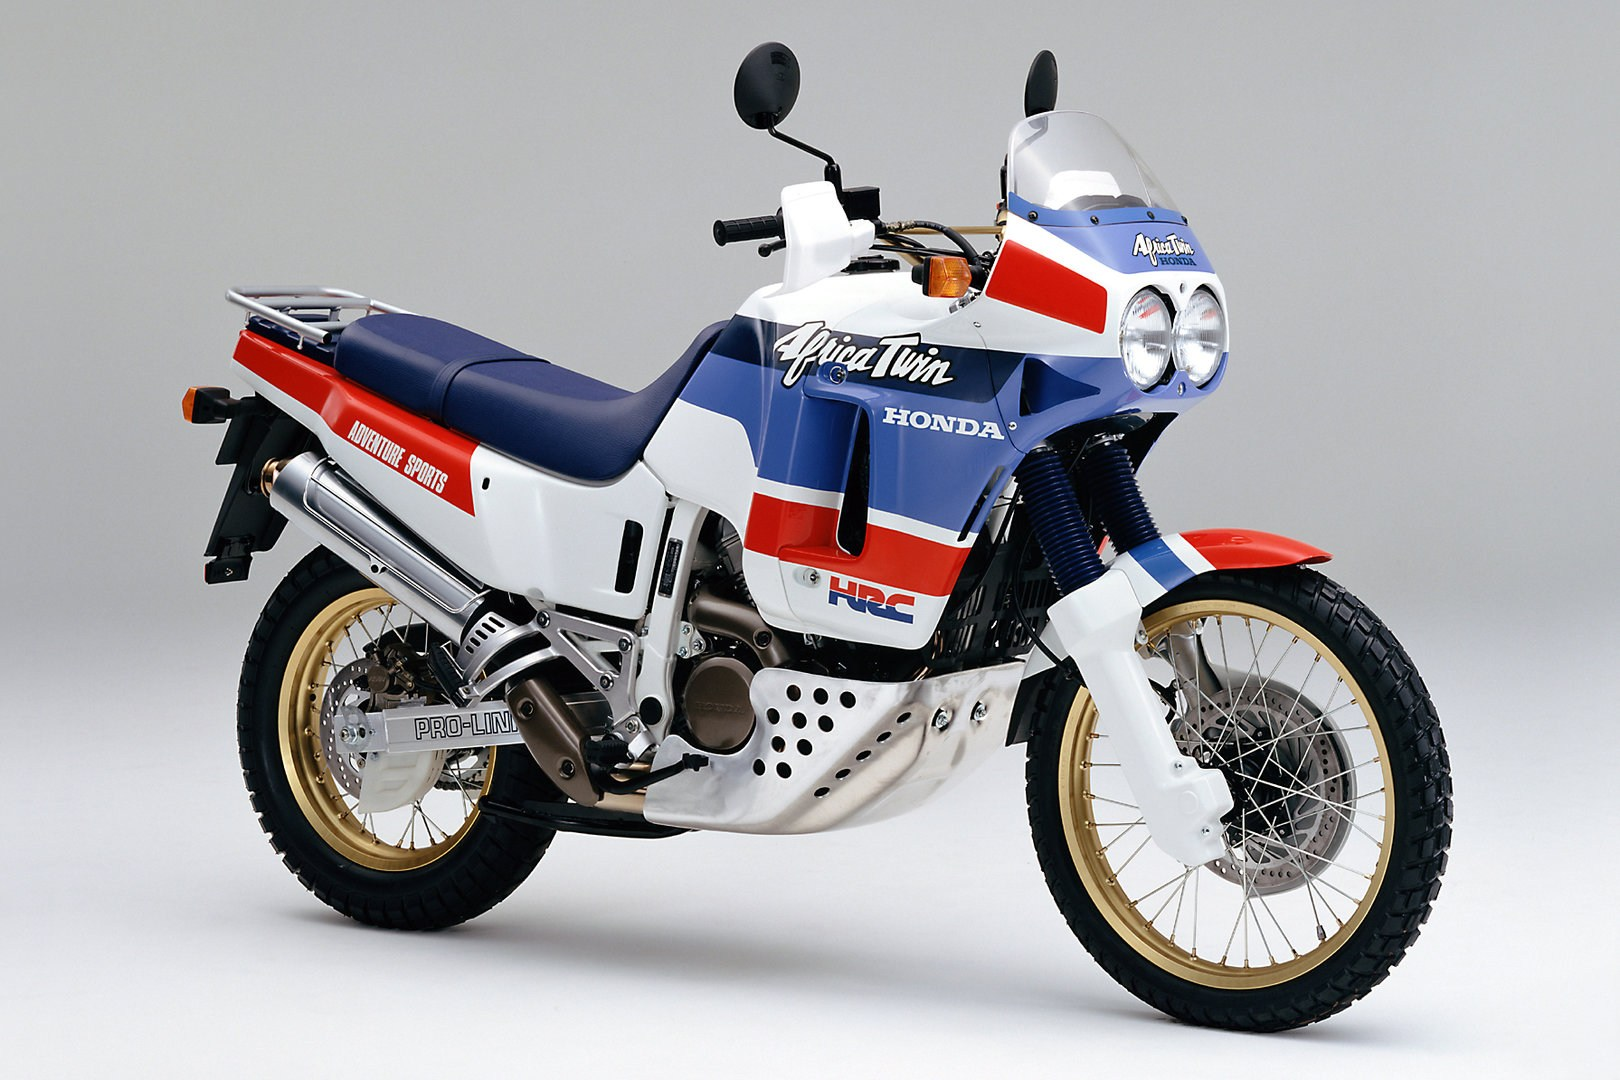 Honda XRV 650 Africa Twin 1988